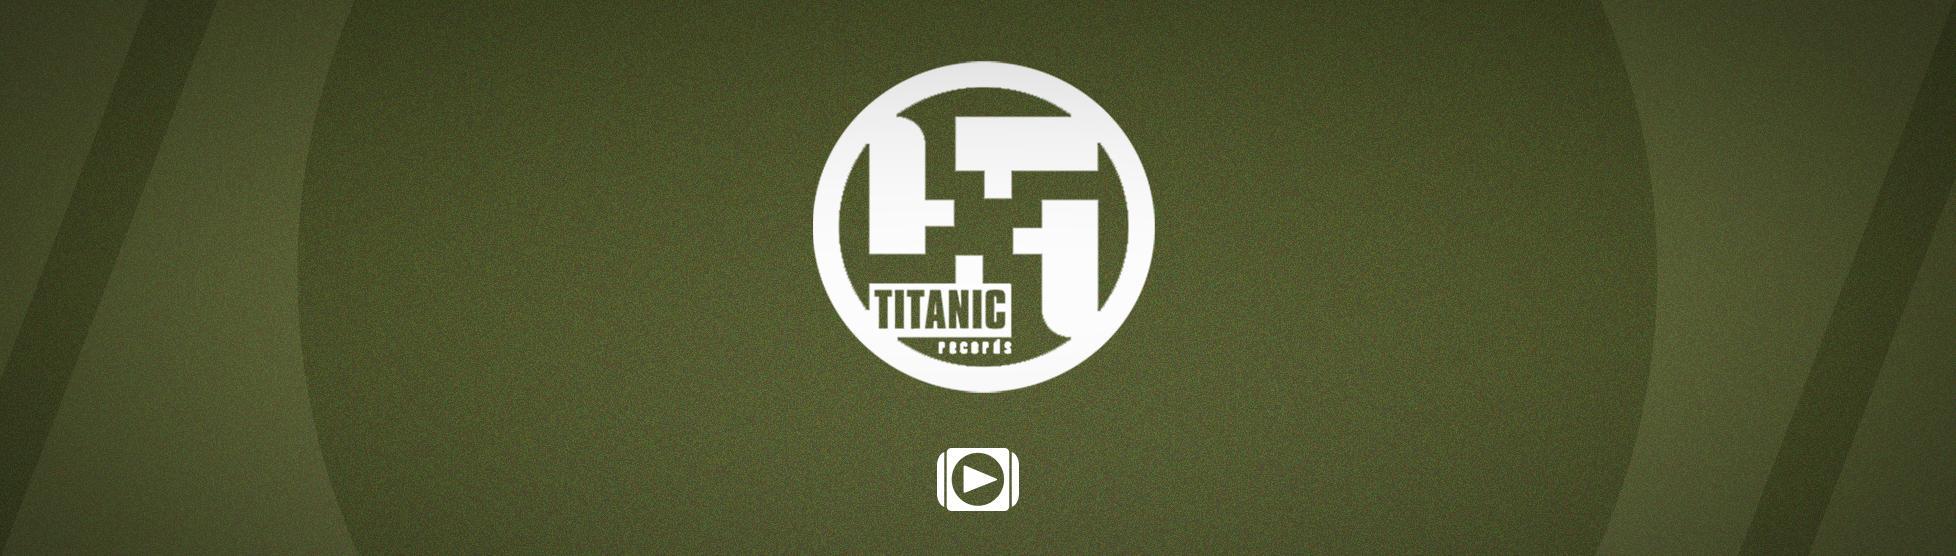 578c0384 Titanic Records Tracks - Artists - Hardstyle.com: Home of Hardstyle